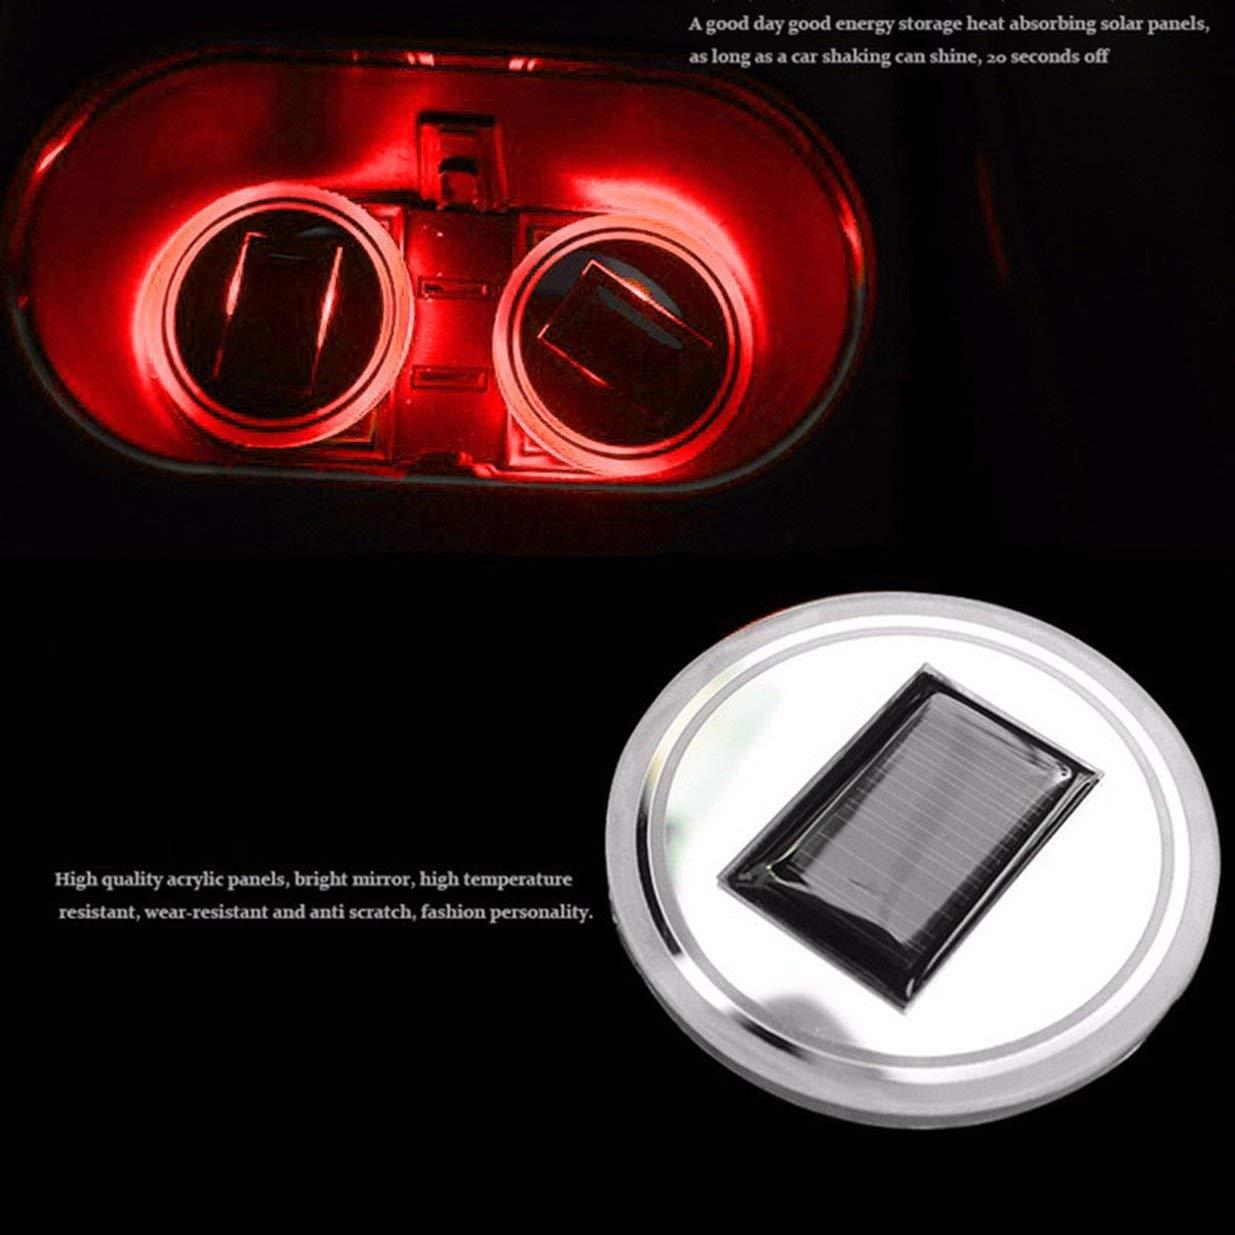 Universal Solar LED Car Holder Portavasos antideslizante Impermeable Pad Botella Bebidas Coaster Atm/ósfera L/ámpara para Coche SUV Cami/ón